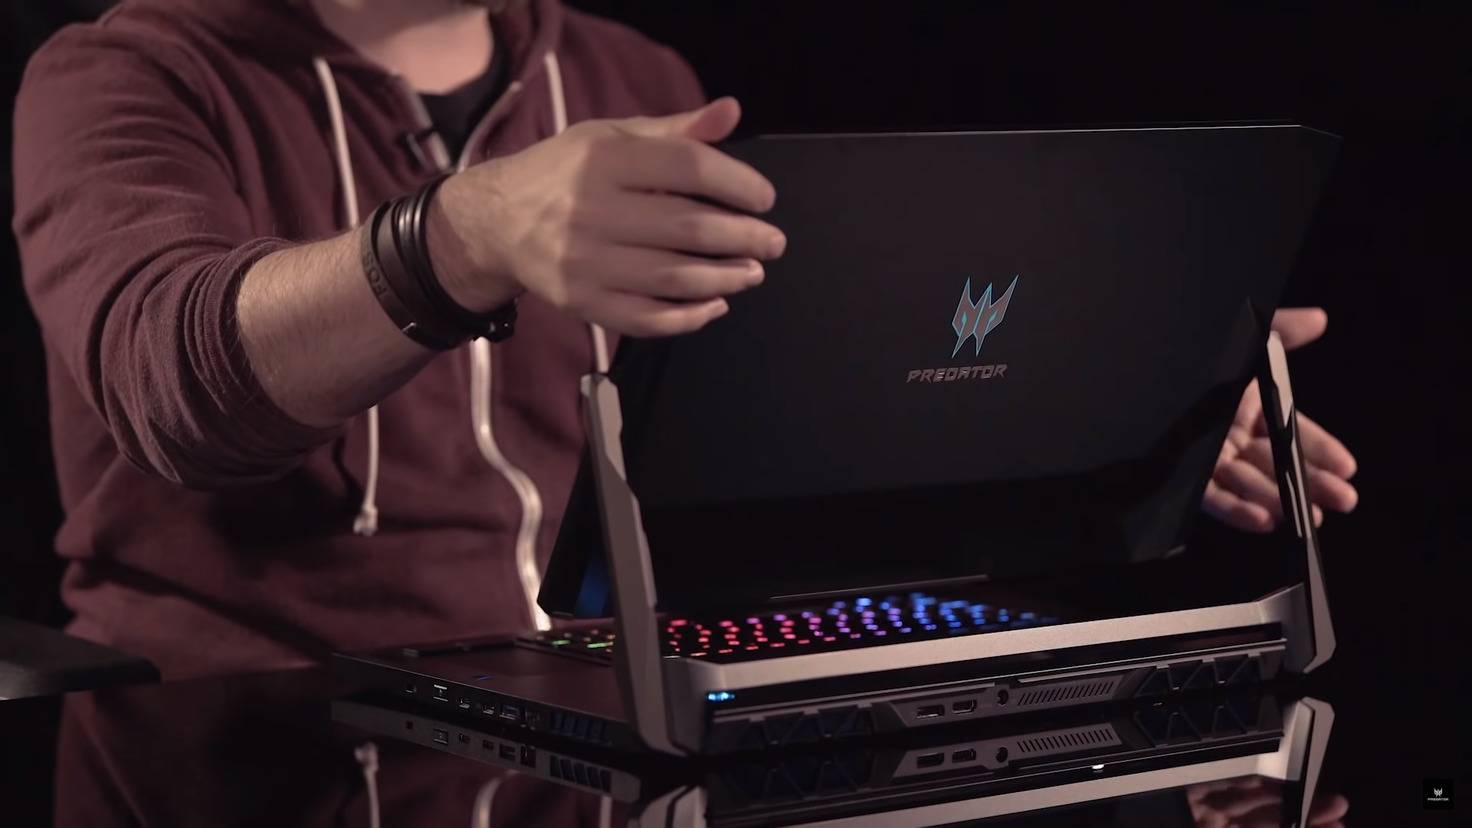 Acer-Predator-Triton-900-Gaming-Convertible